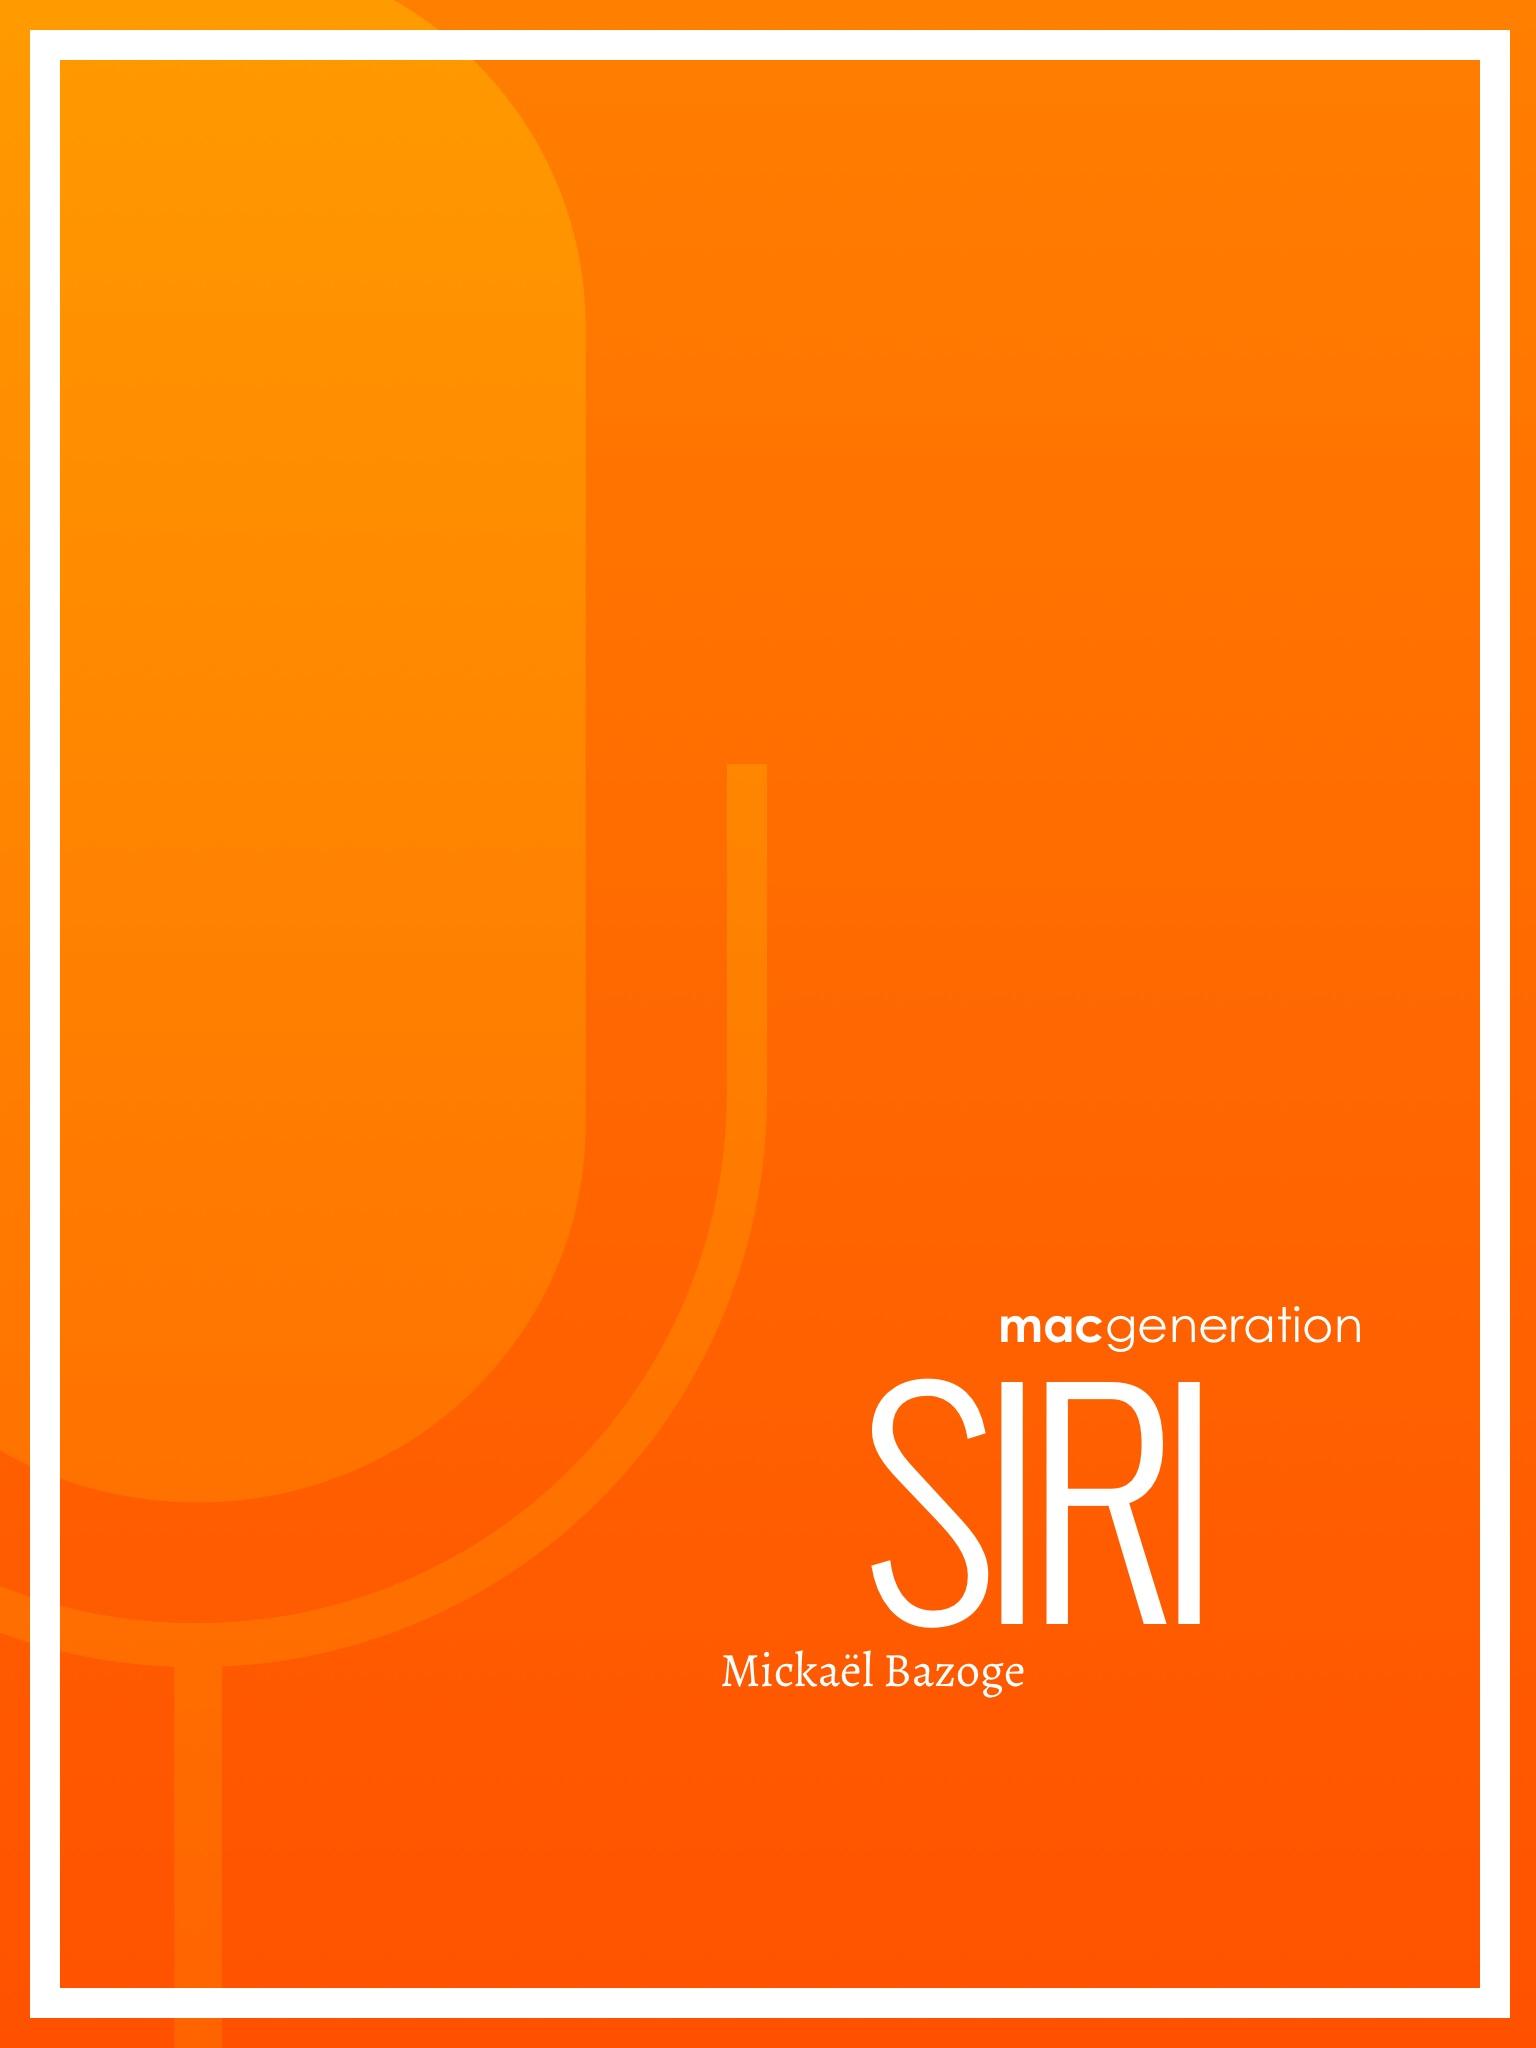 livres/savoir-siri.jpg